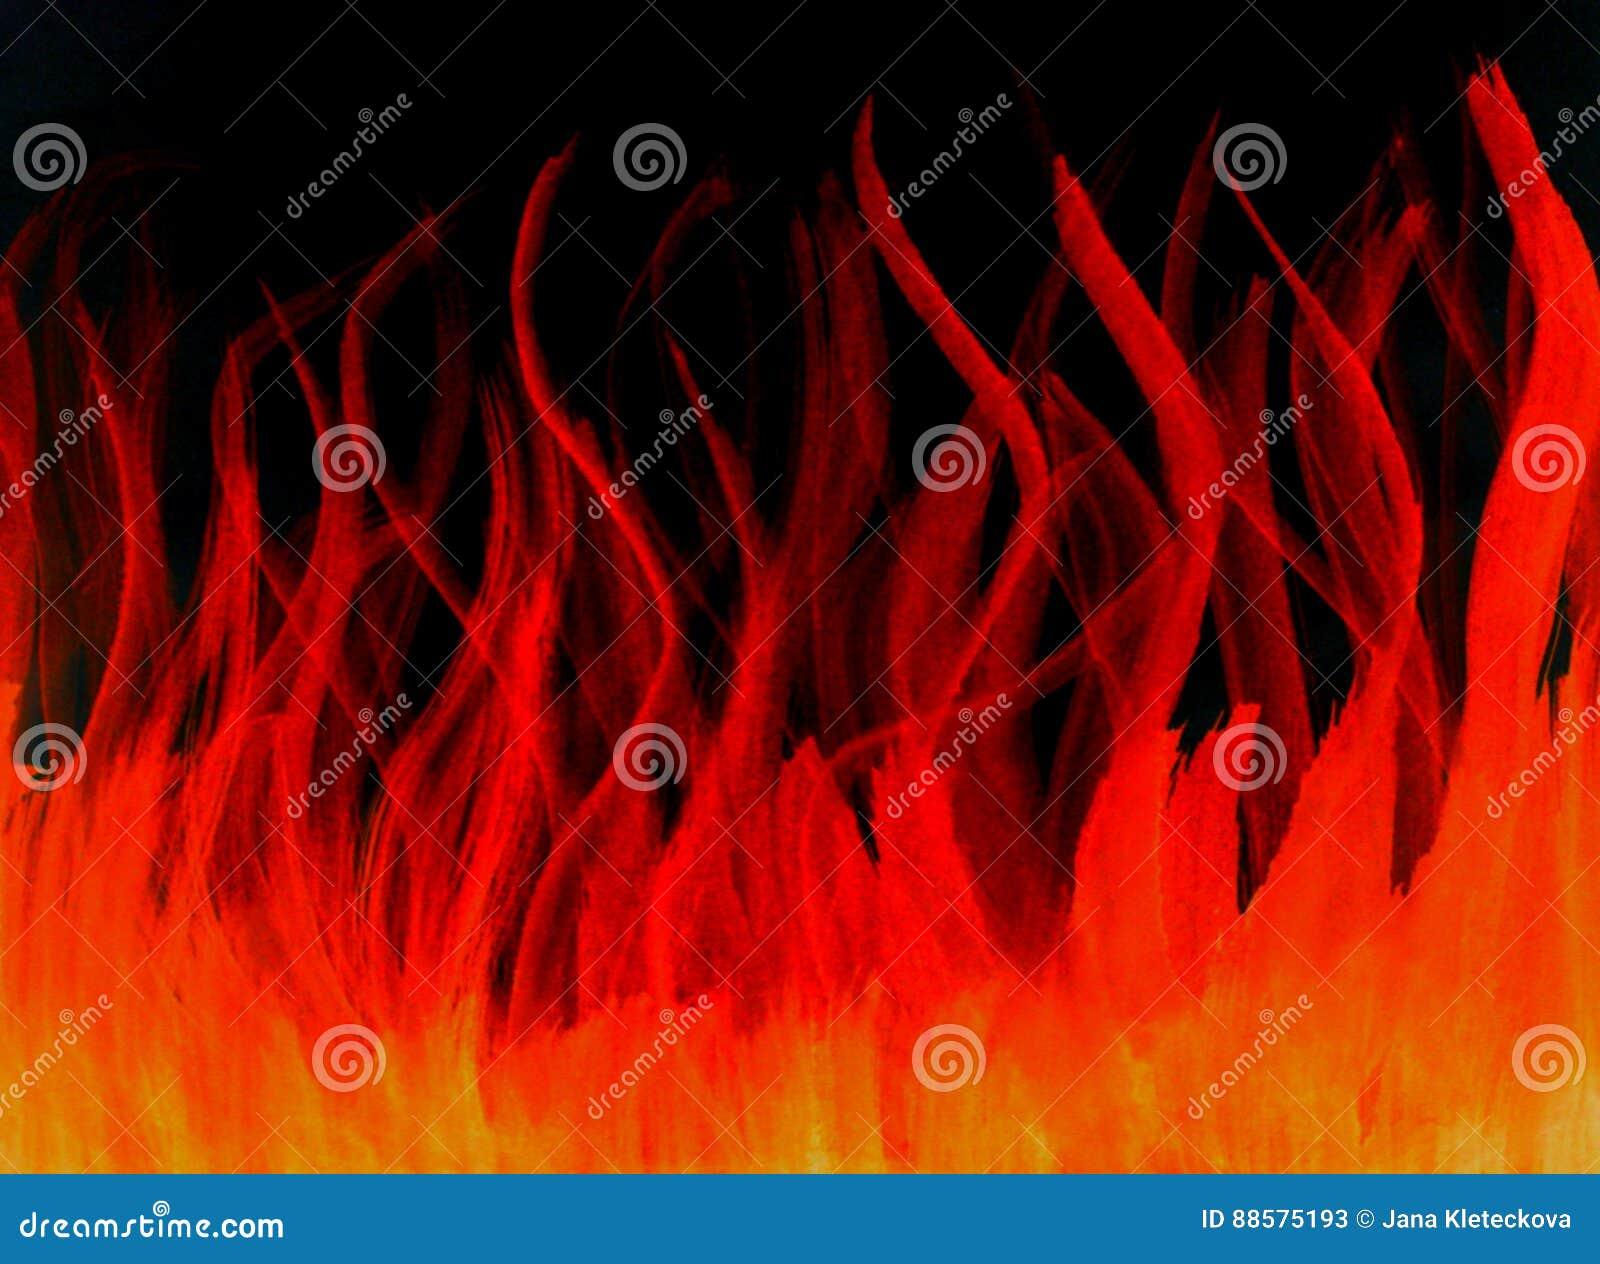 Ateie fogo à aquarela alaranjada vermelha quente impetuosa tirada isolada